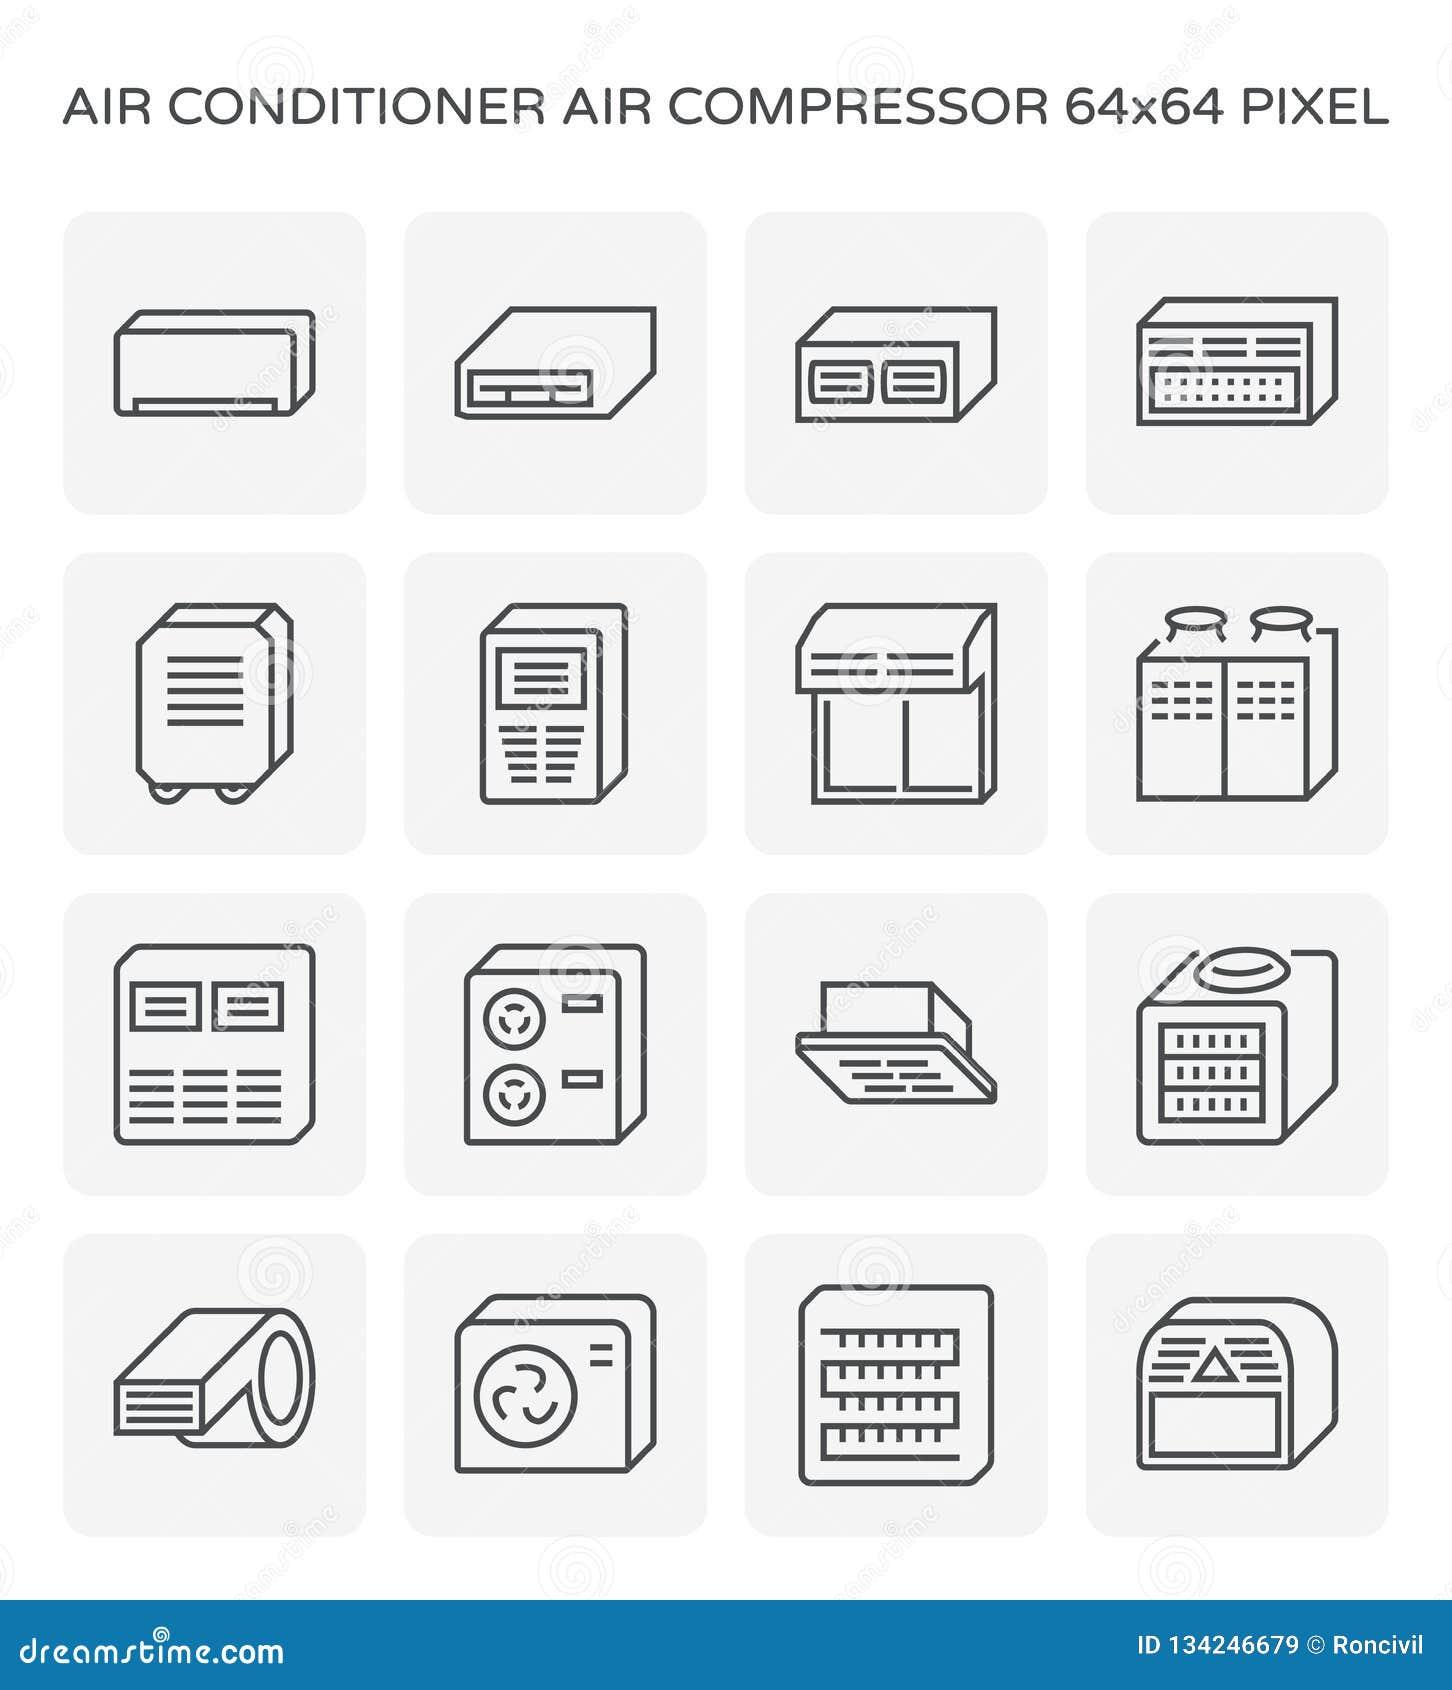 Air conditioner icon stock vector  Illustration of illustration